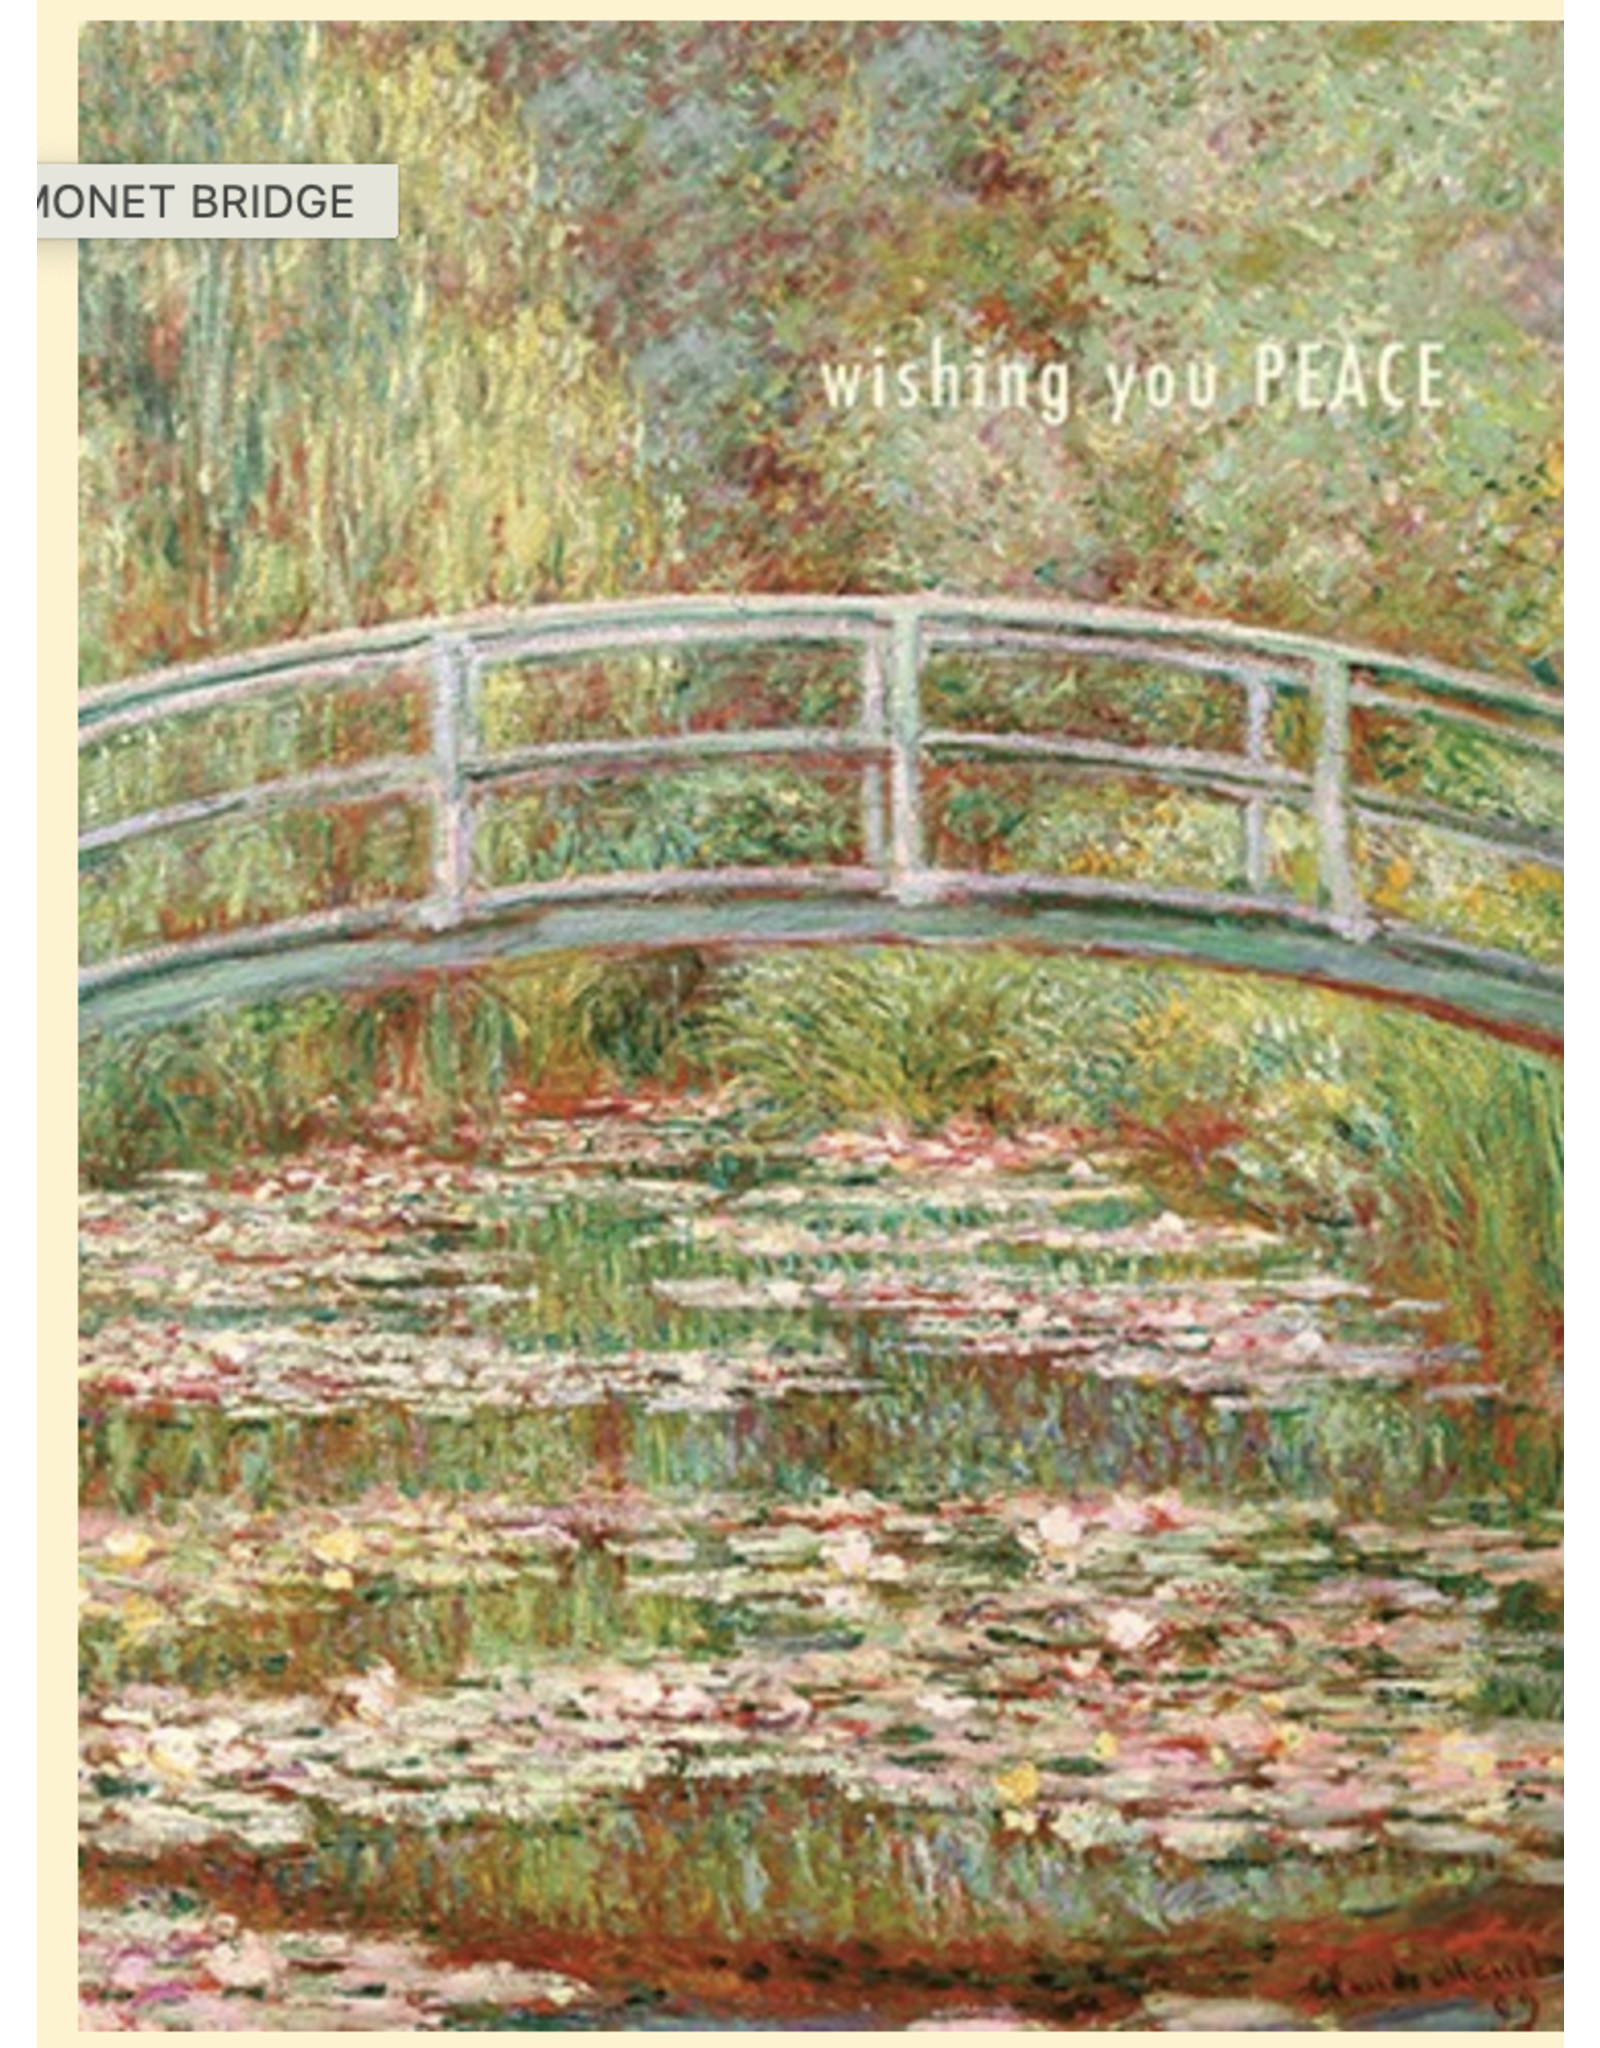 Sympathy - Wishing You Peace Monet Bridge